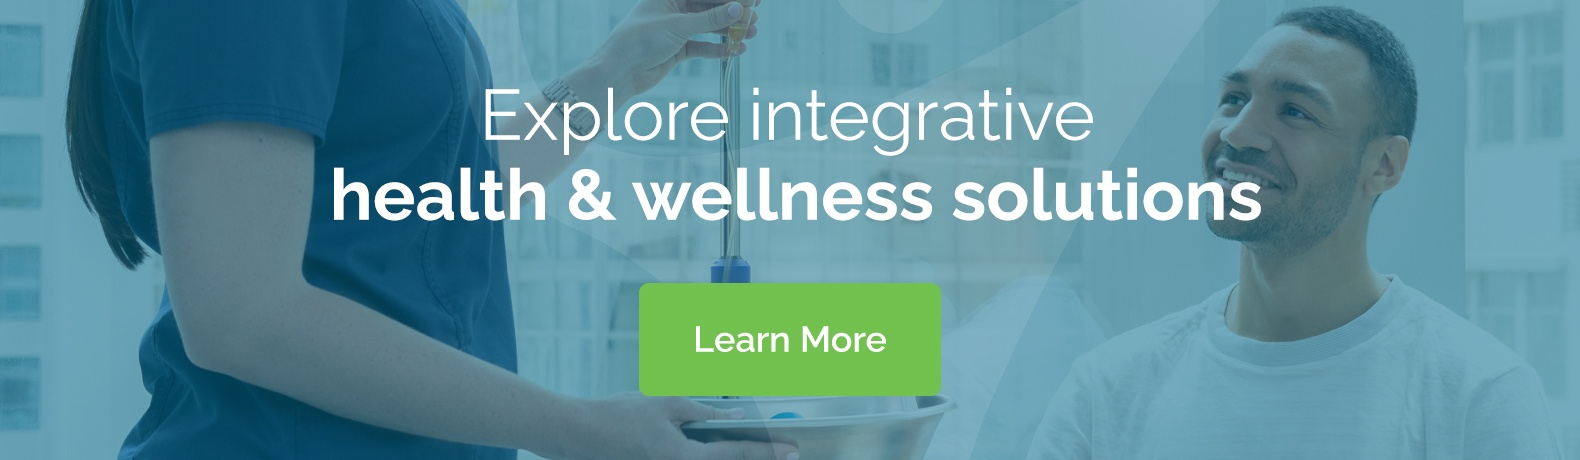 Explore integrative health & wellness solutions